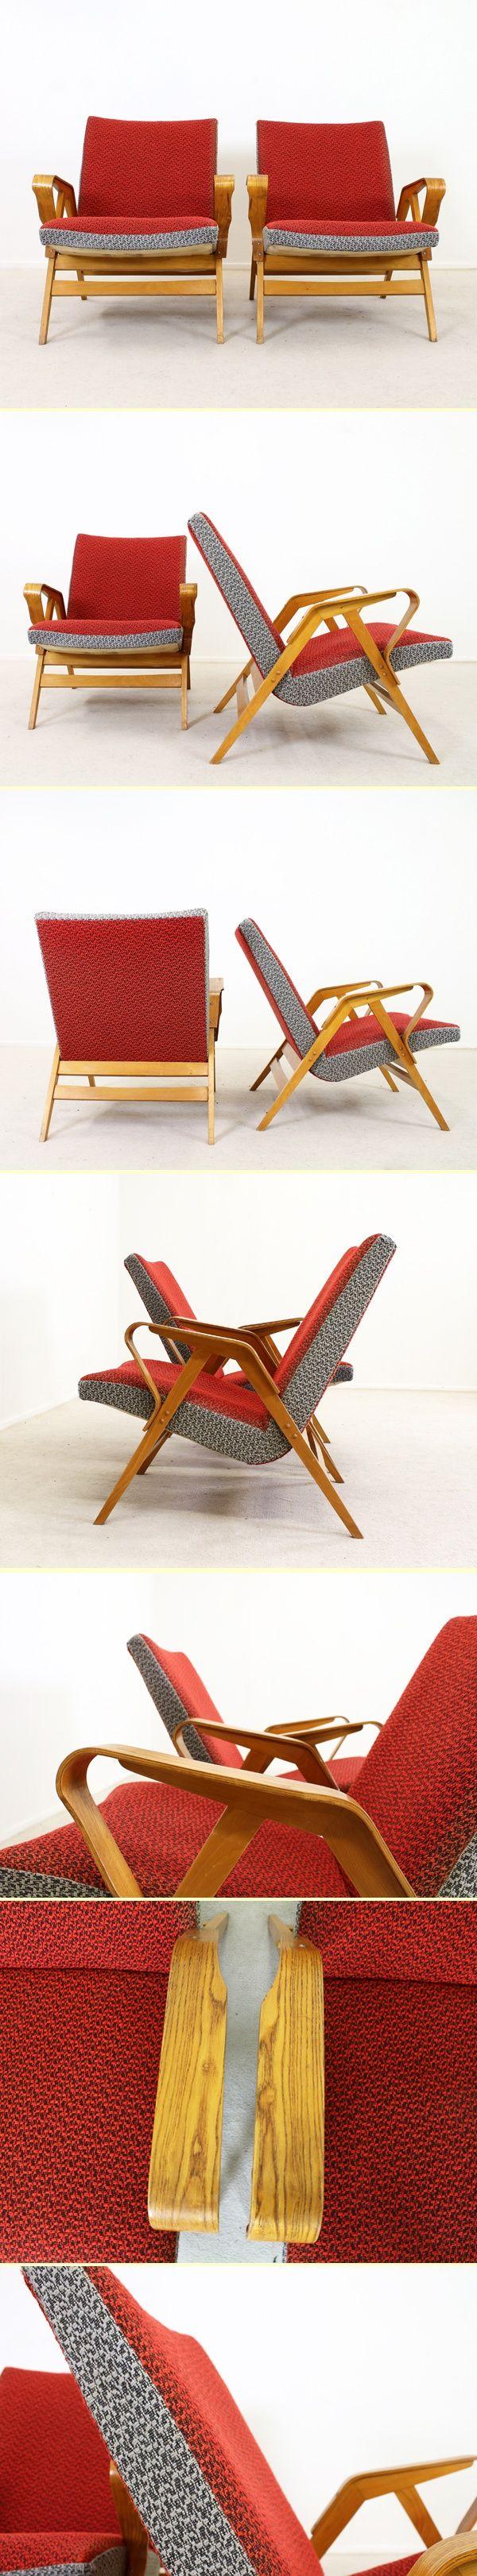 Two beautiful organic easy lounge chairs 1904